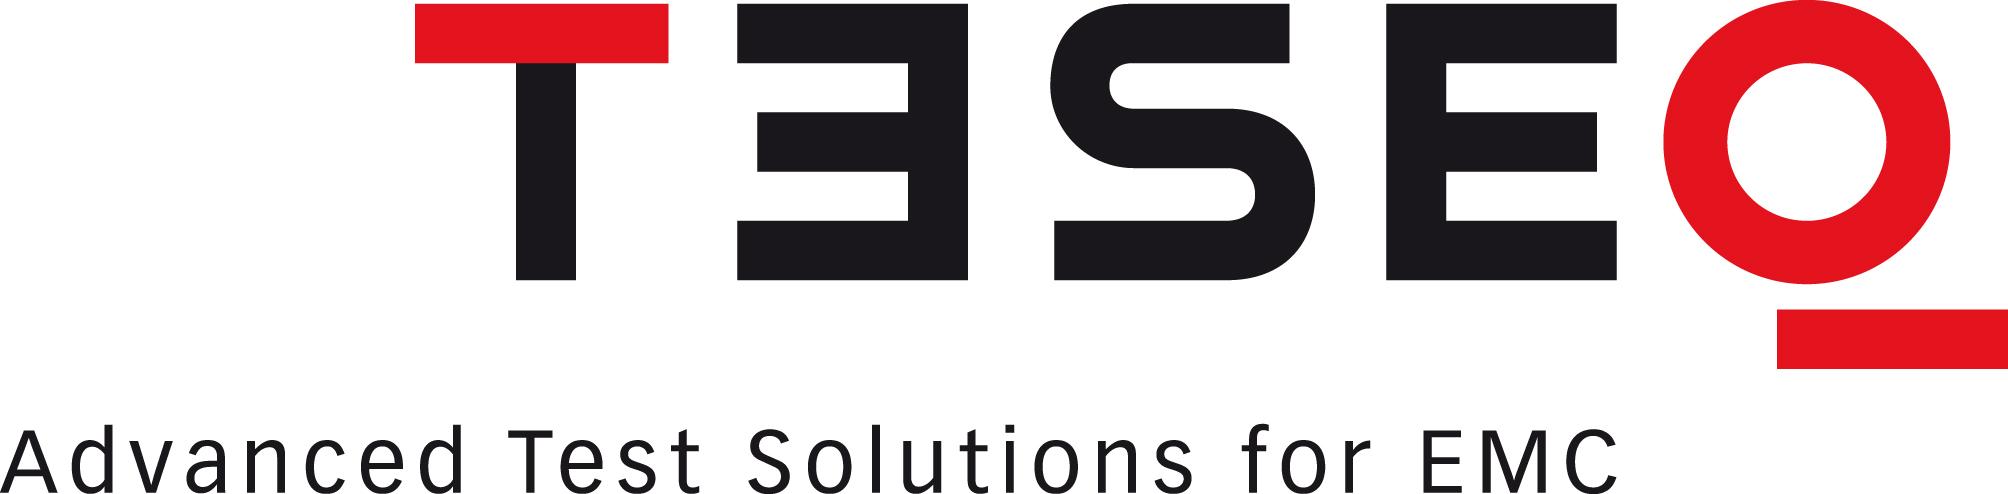 Teseq_Logo_1.31.2014